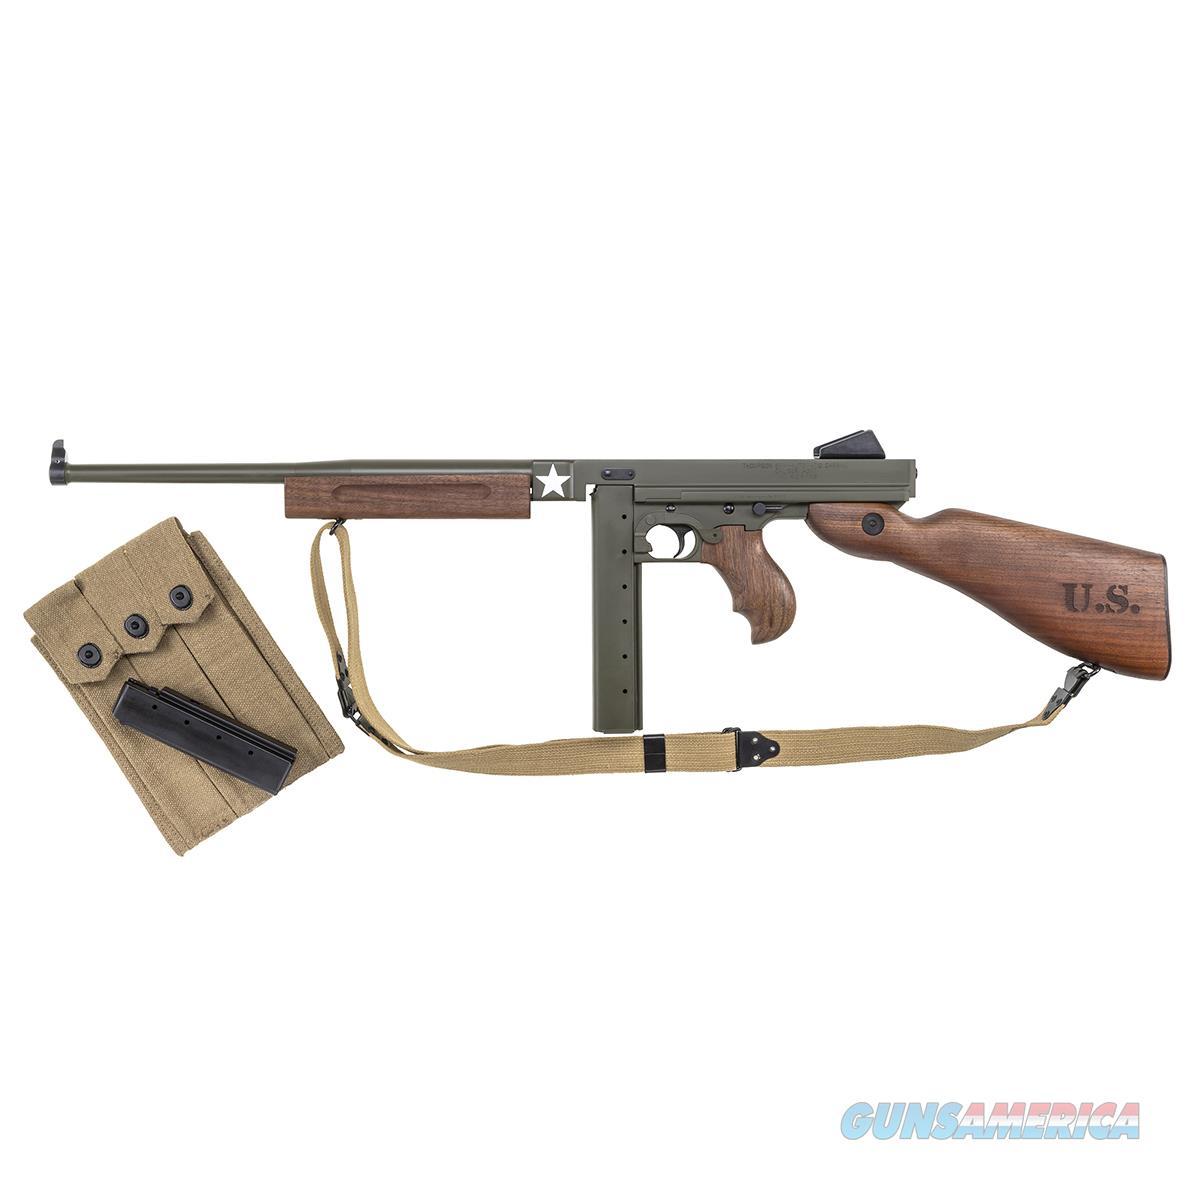 Auto-Ordnance Tanker WWII Thompson M1 Carbine .45 ACP TM1C1   Guns > Rifles > Auto Ordnance Rifles